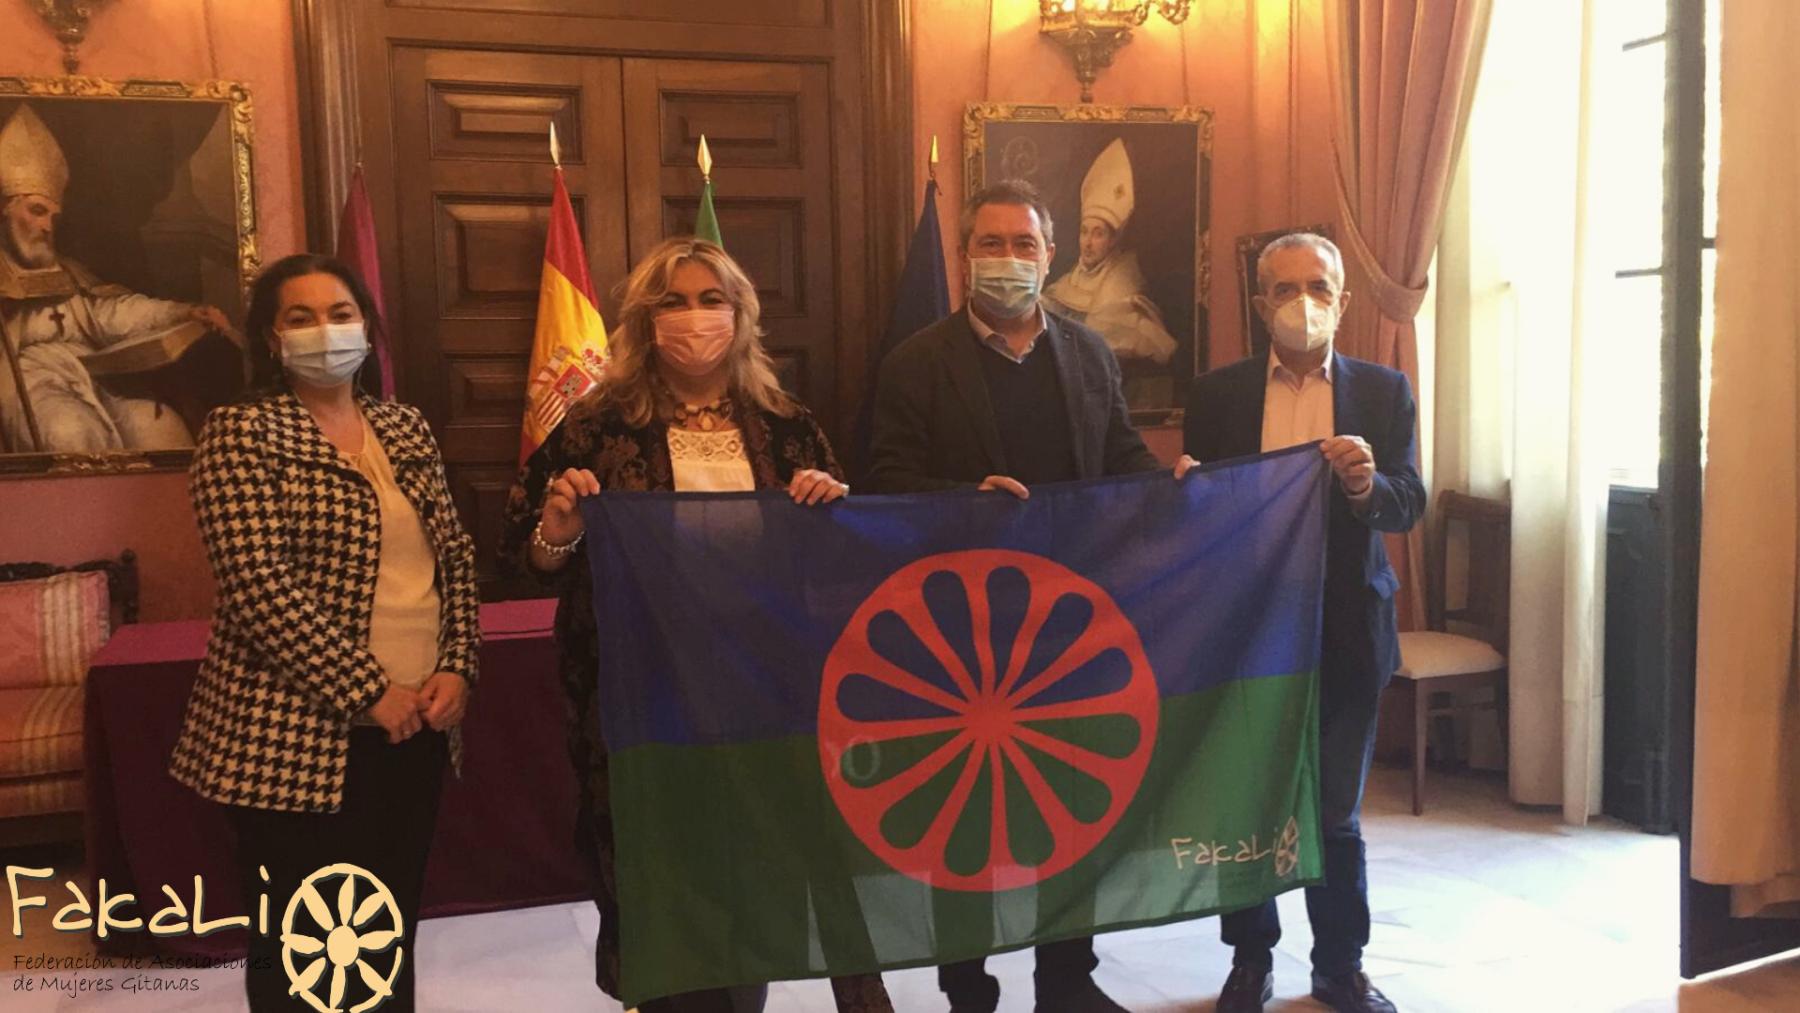 alcalde reunion bandera fakali 20 noviembre 2020